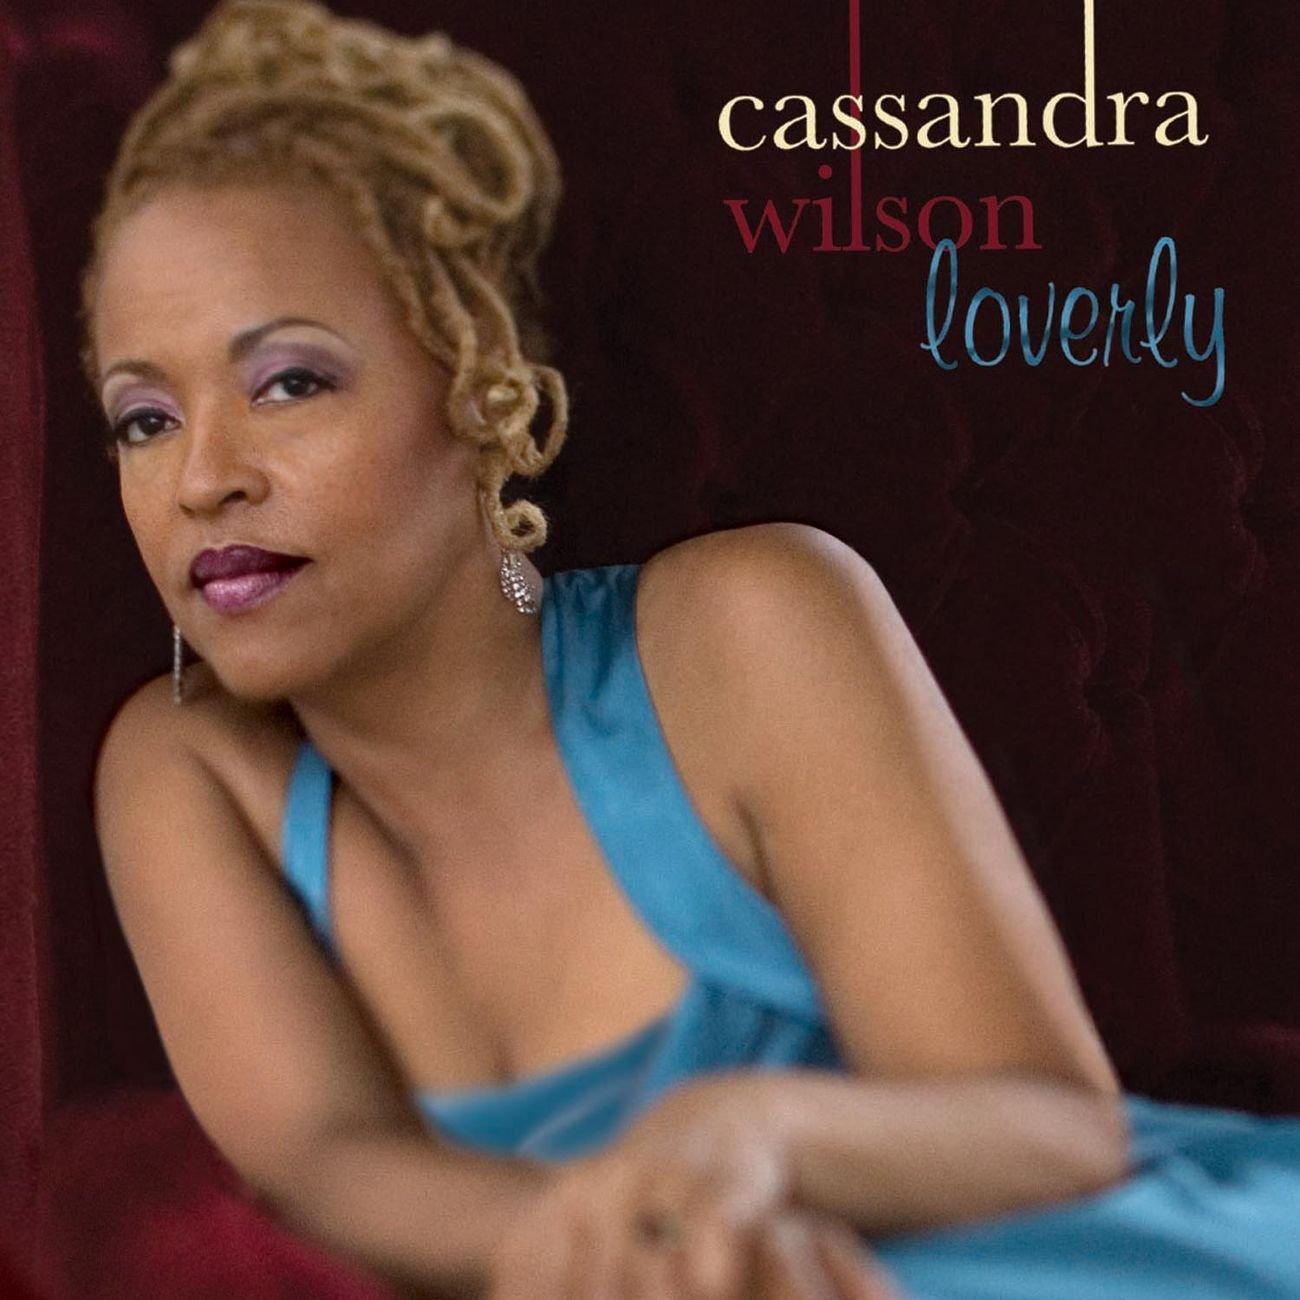 Cassandra Wilson - Loverly (2008) [FLAC] Download